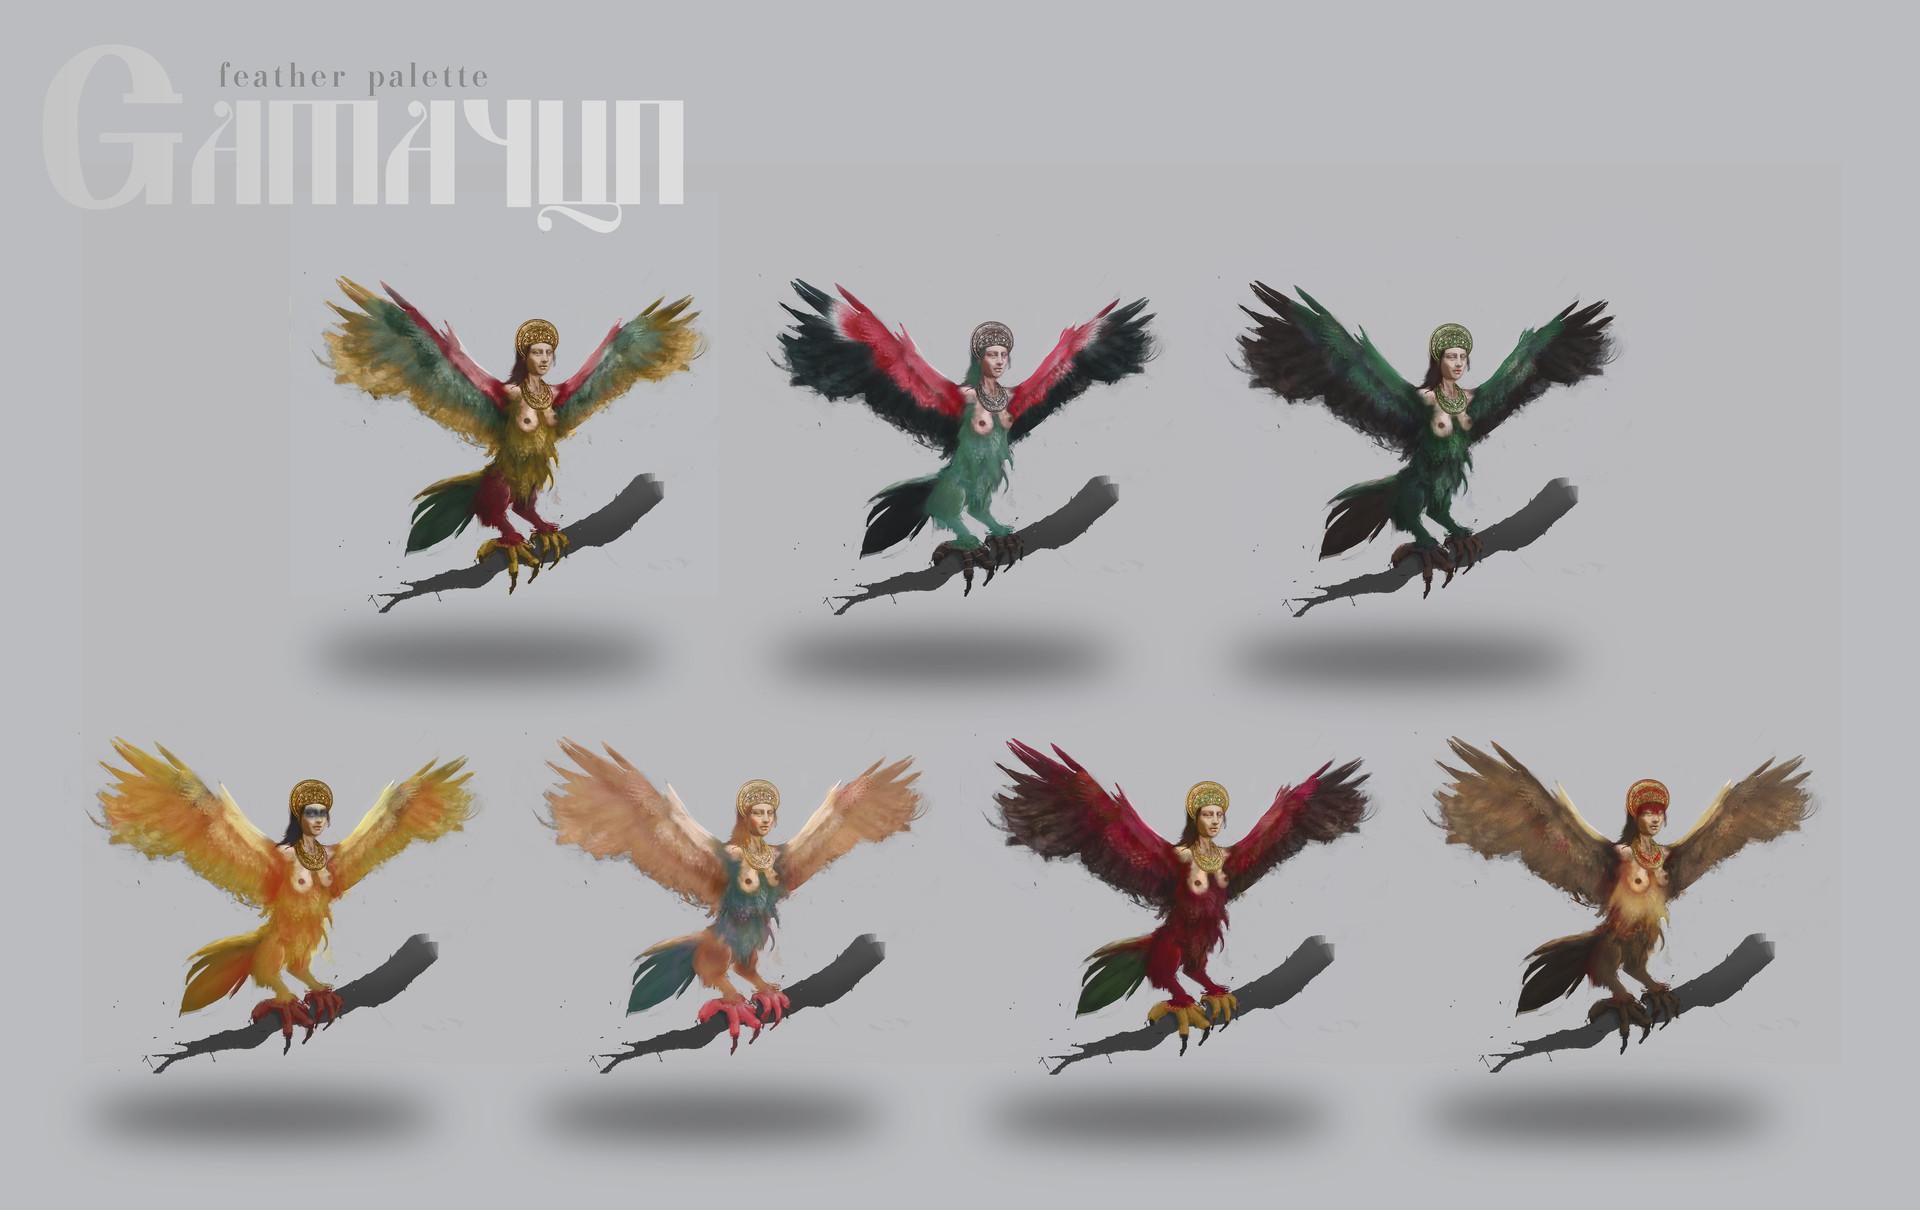 Maya grishanowitch gamayun featherpalettev2